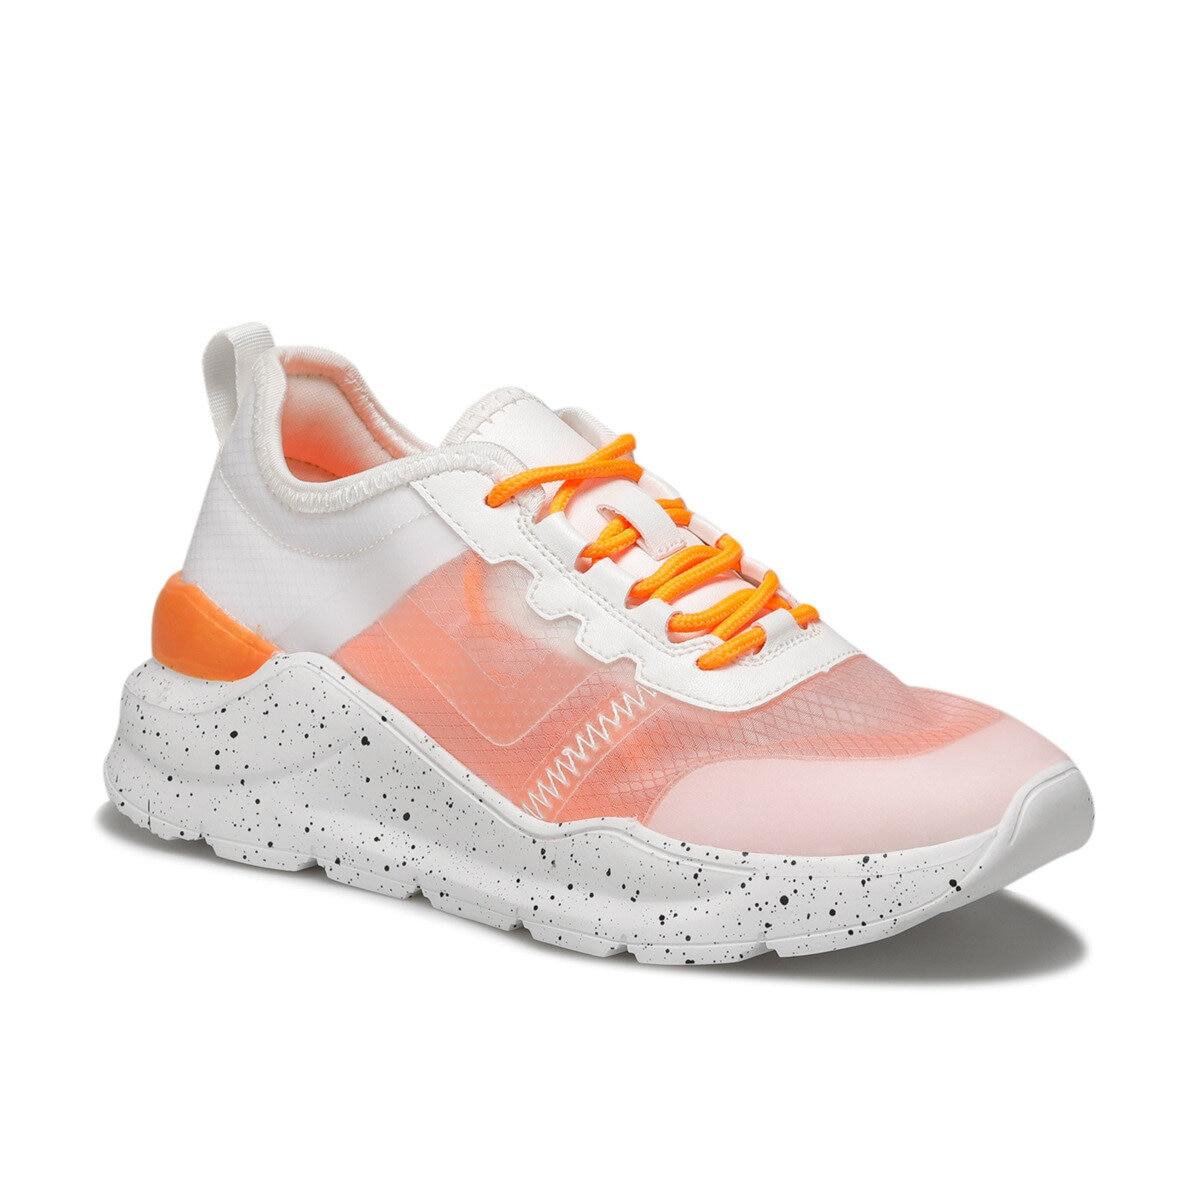 FLO FASHION White Women 'S Sneaker Shoes LUMBERJACK